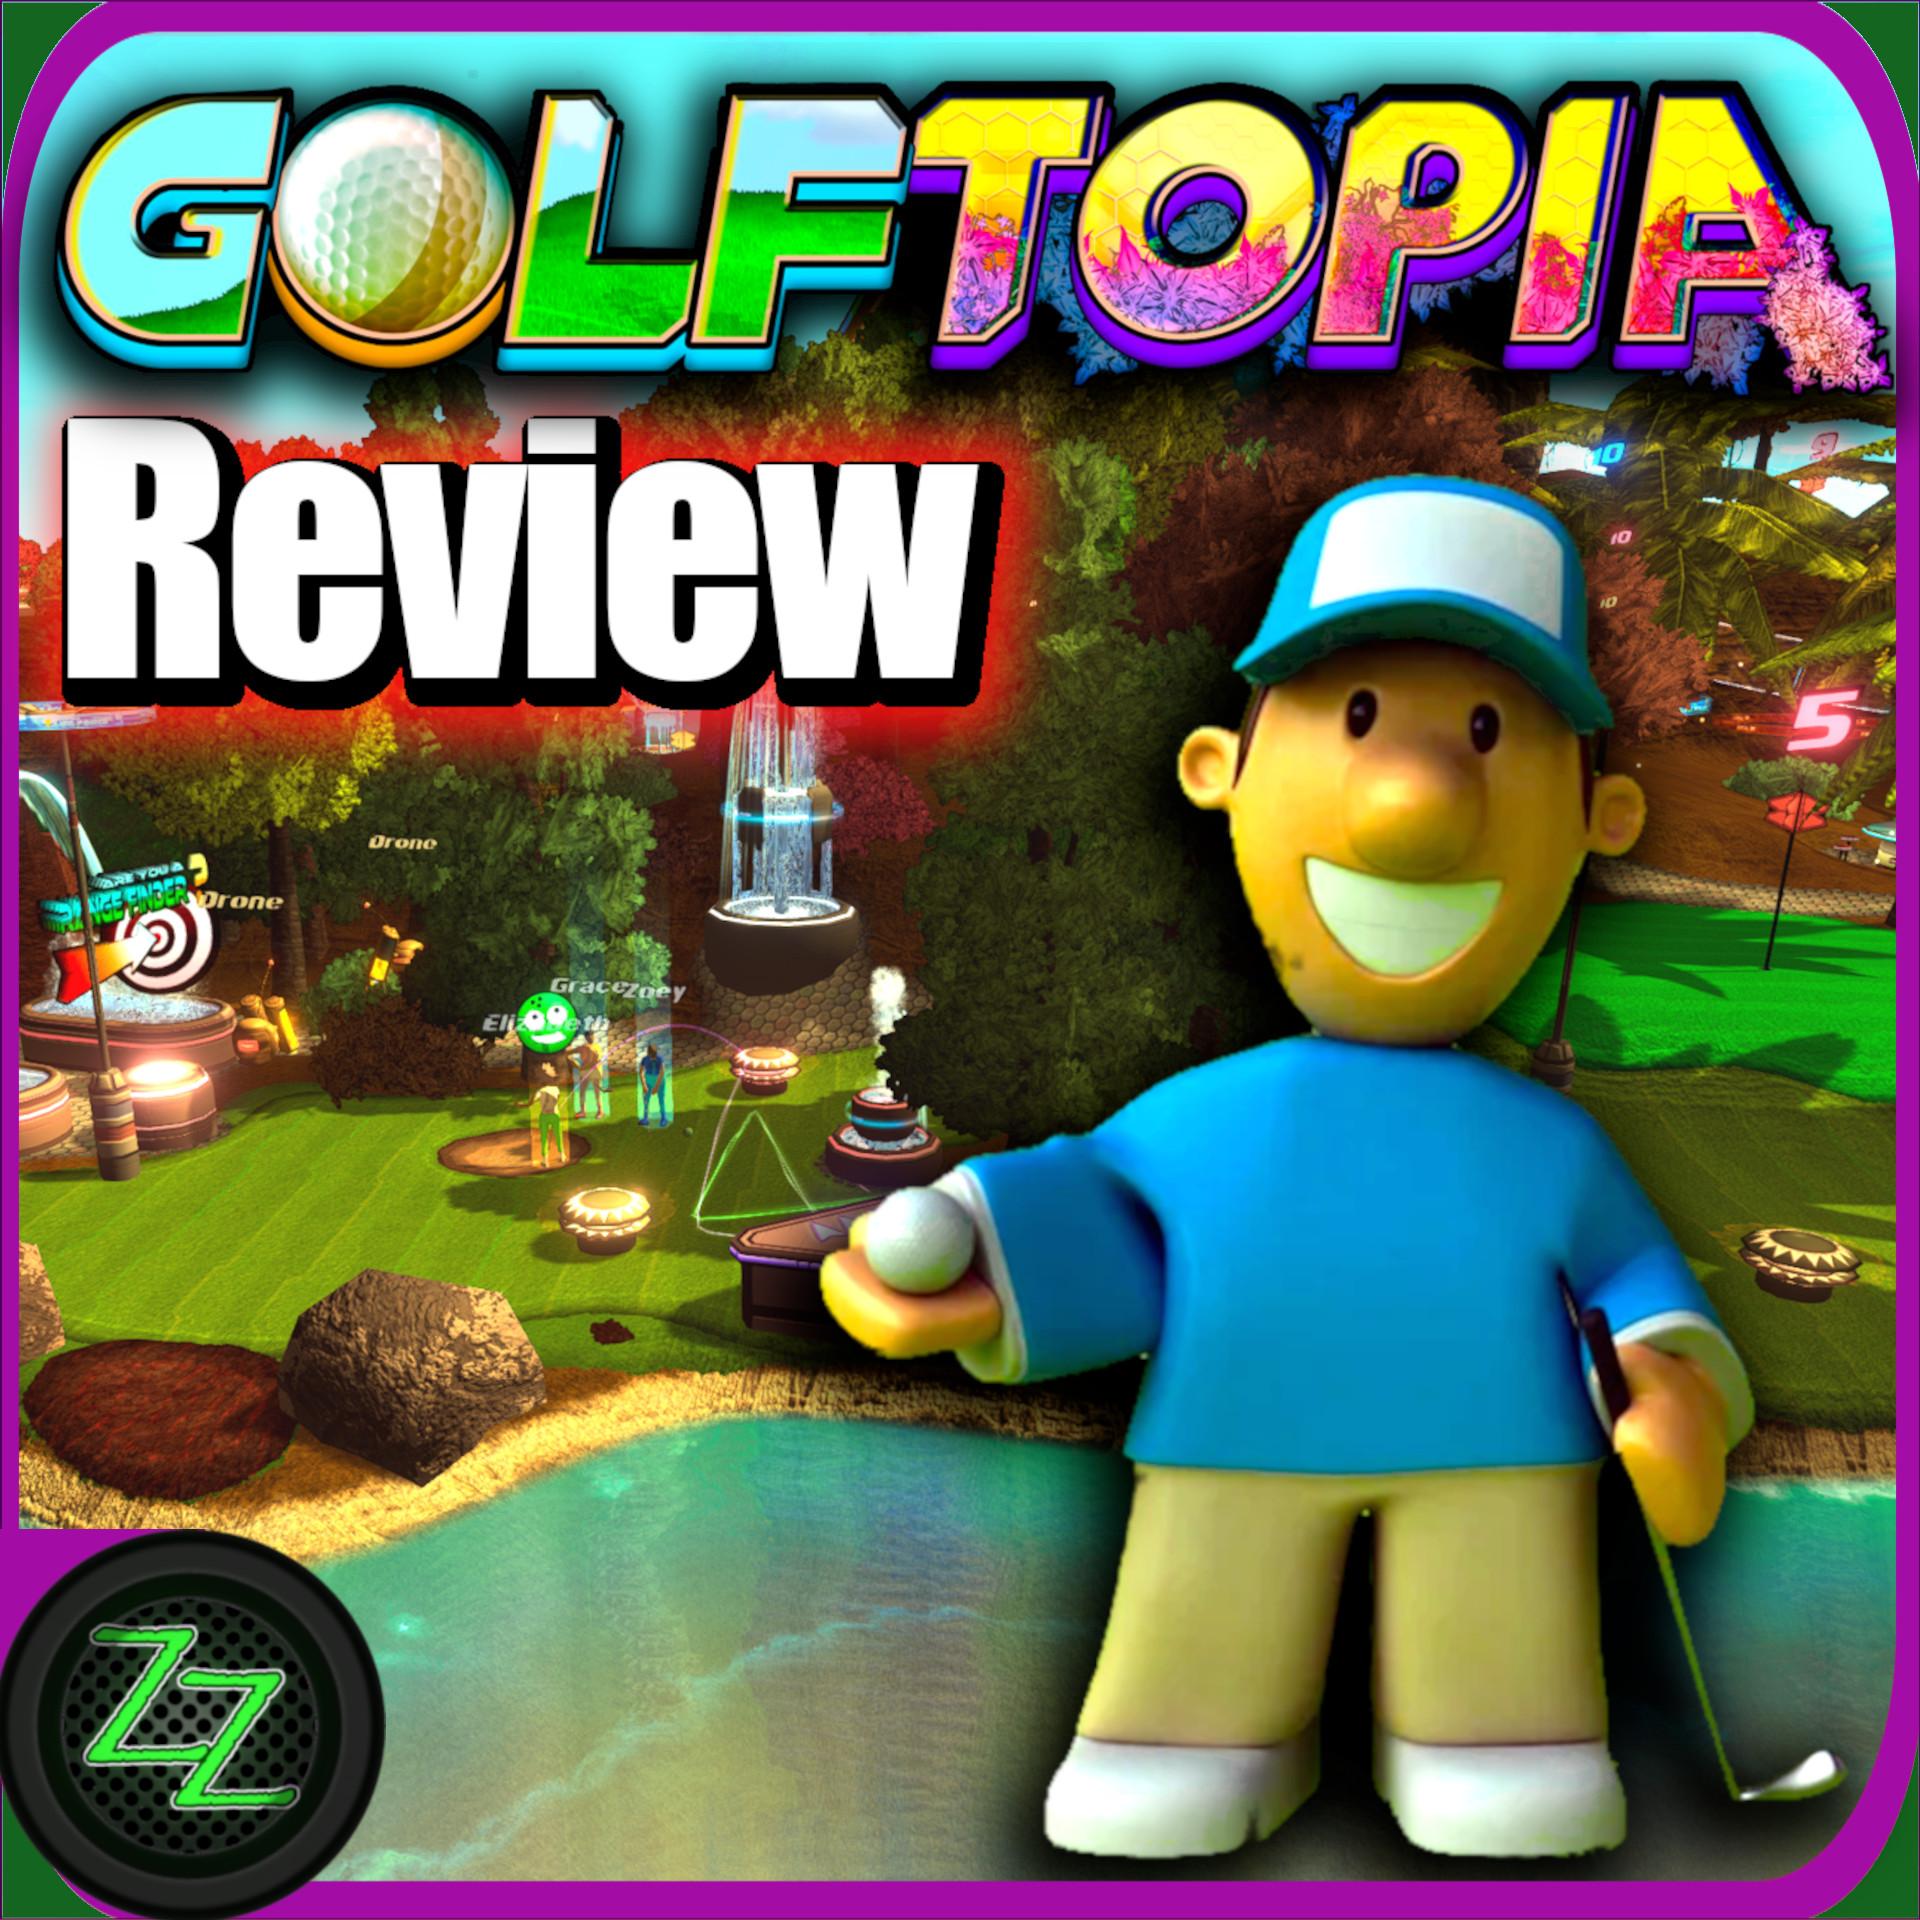 Golftopia Review-Test – SciFi Golfer in bunt – SimGolf or SimTycoon – by zapzockt.de